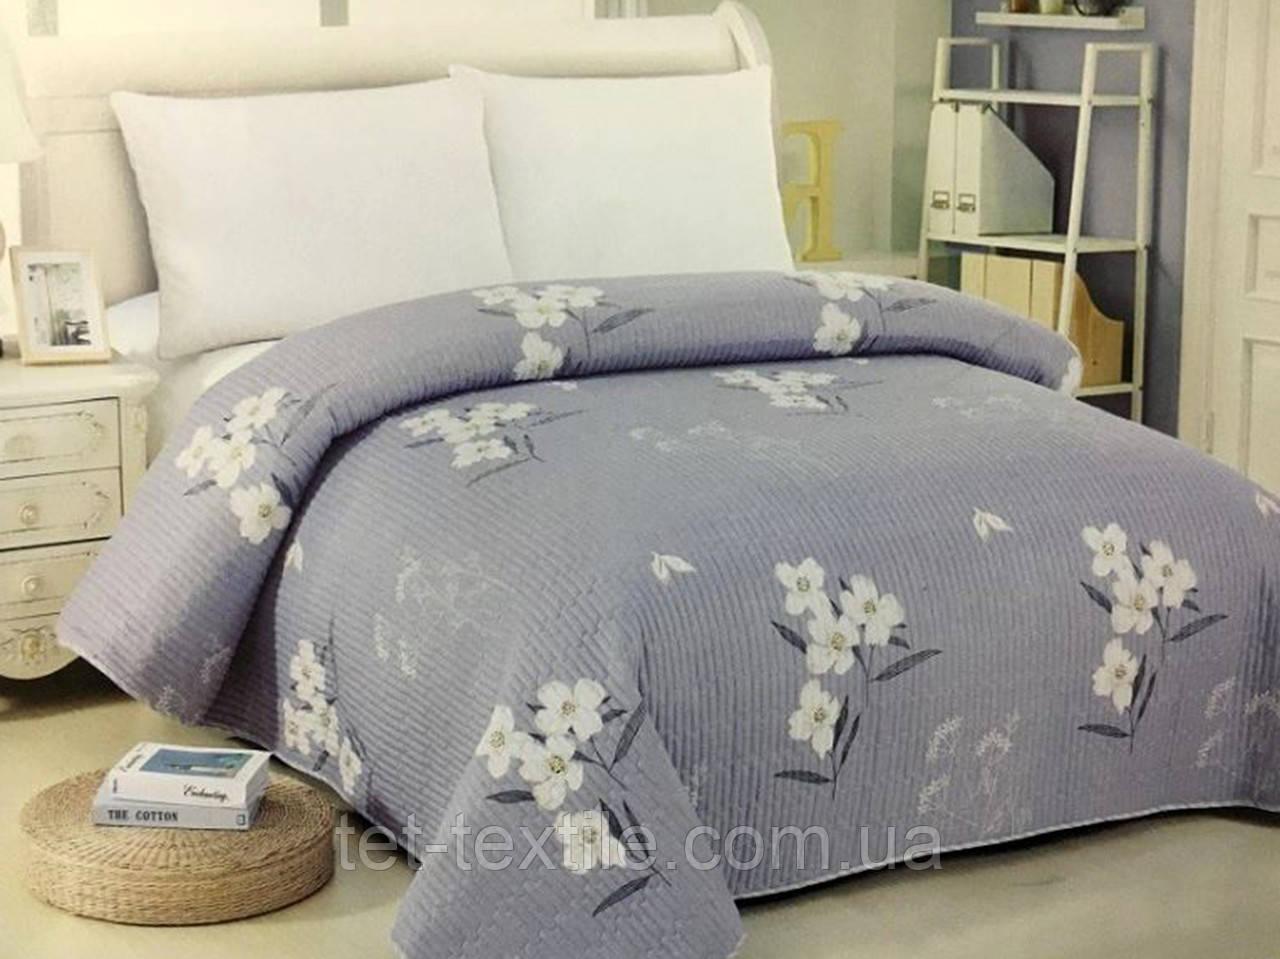 Покрывало Soft Cotton 230х250см.